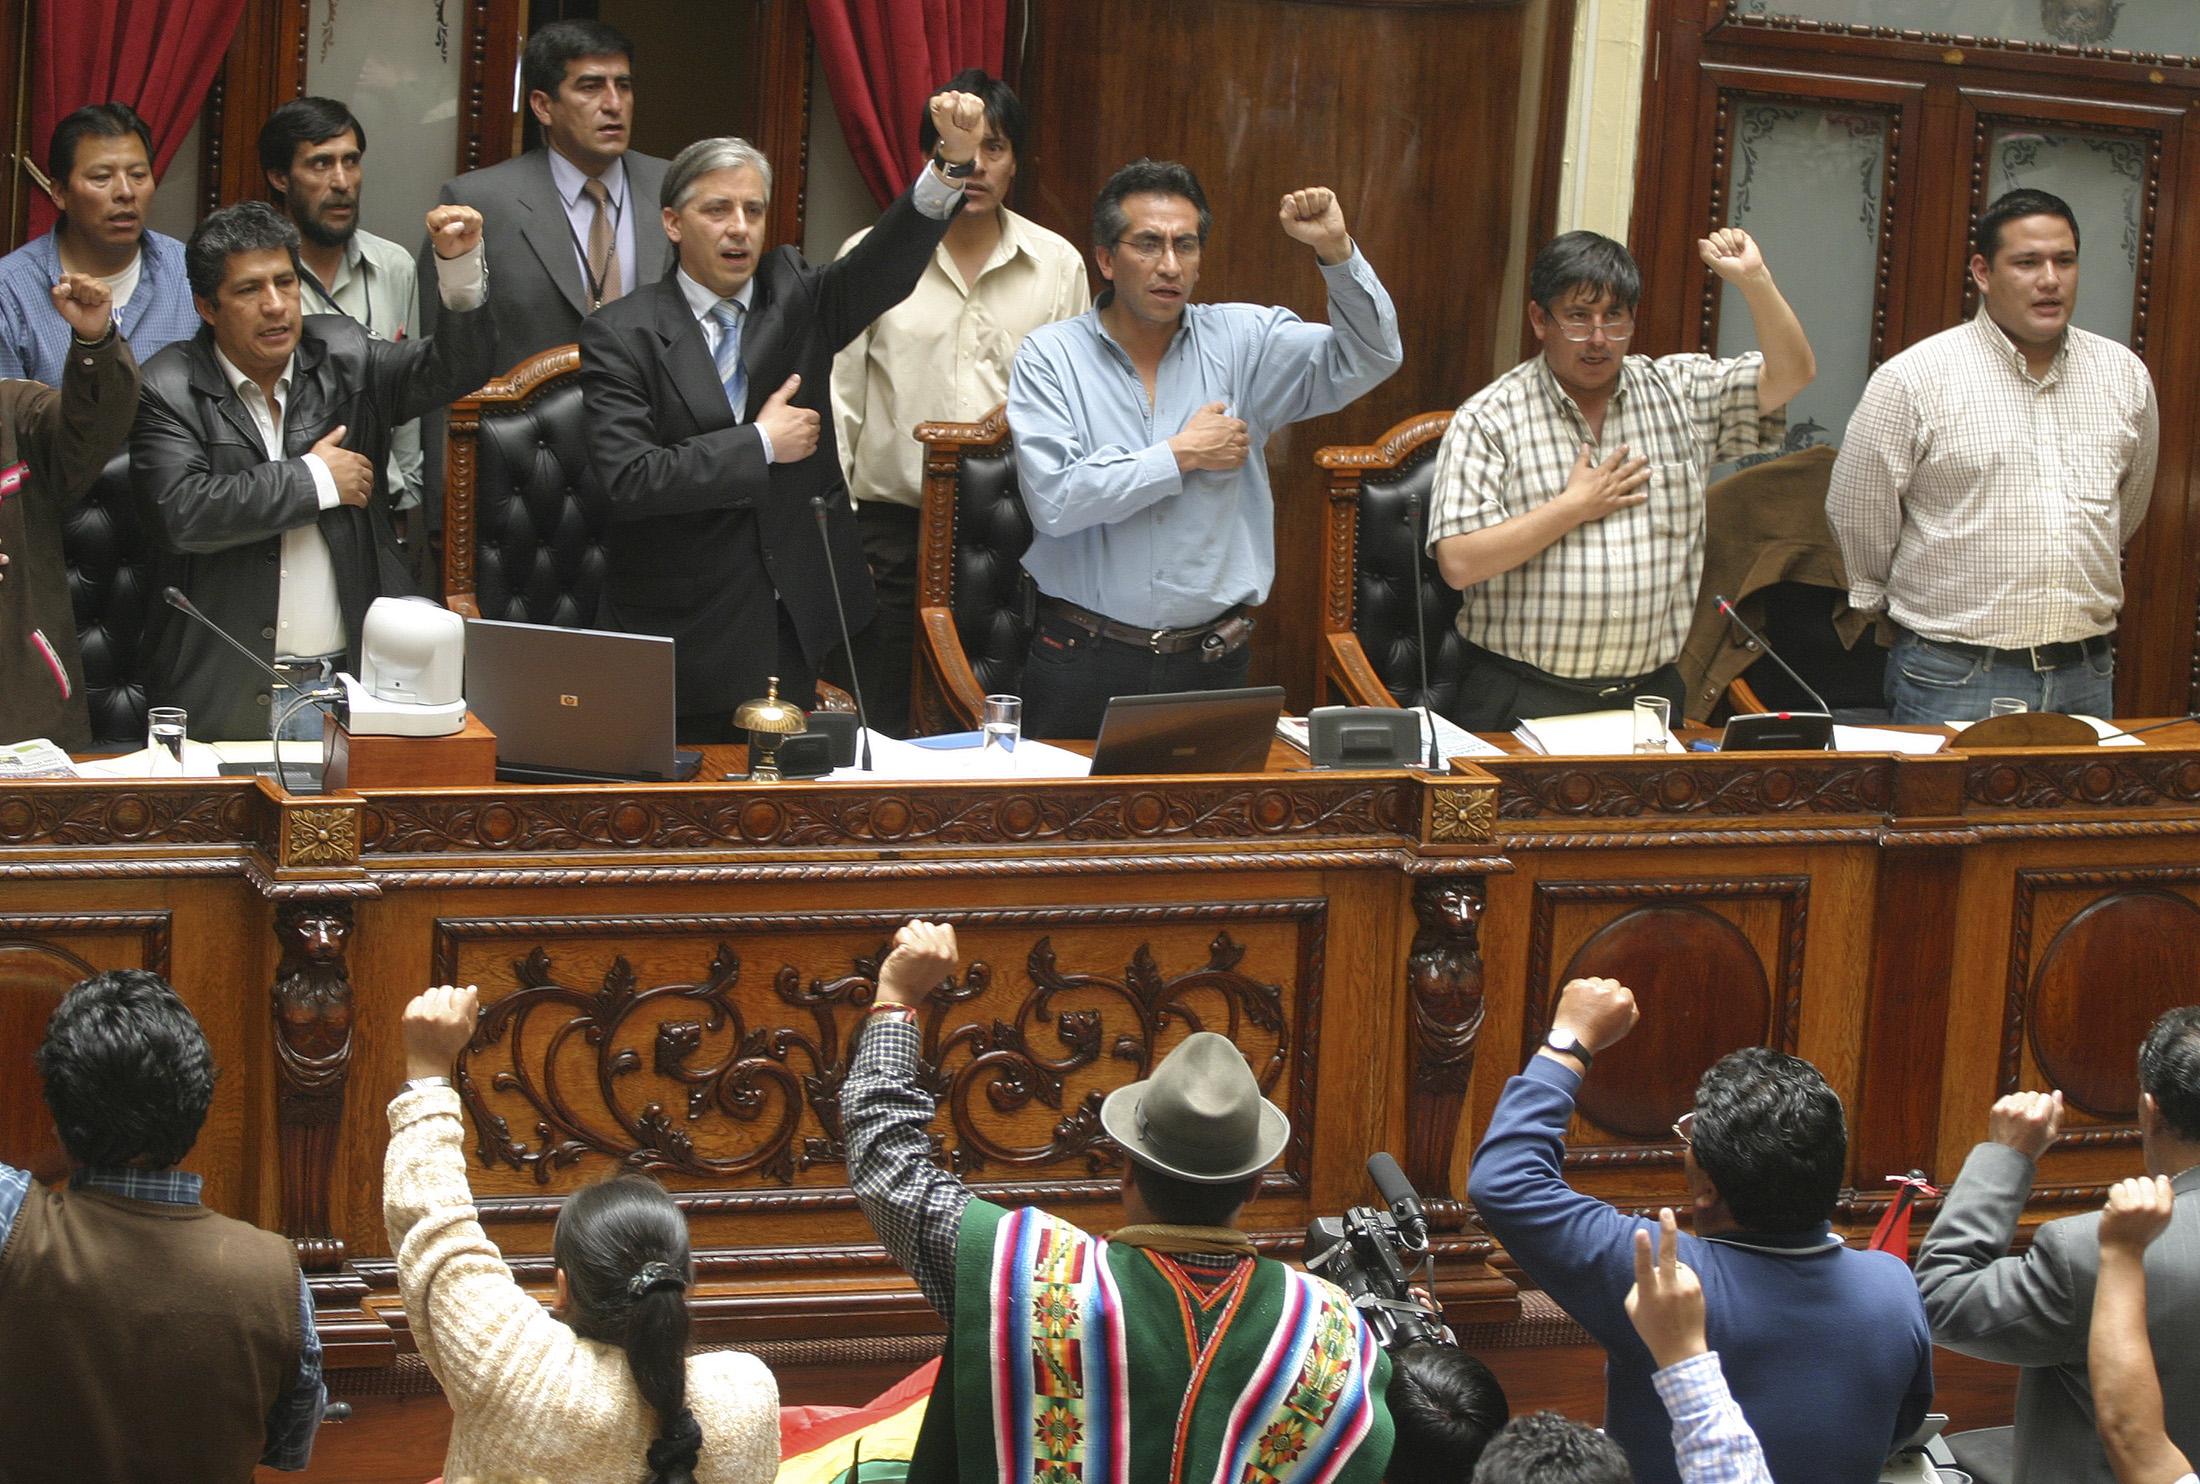 Deputy Novillo, Vice President Linera, Deputy Torrico and Senator Fernandez celebrate the passage of a law in La Paz